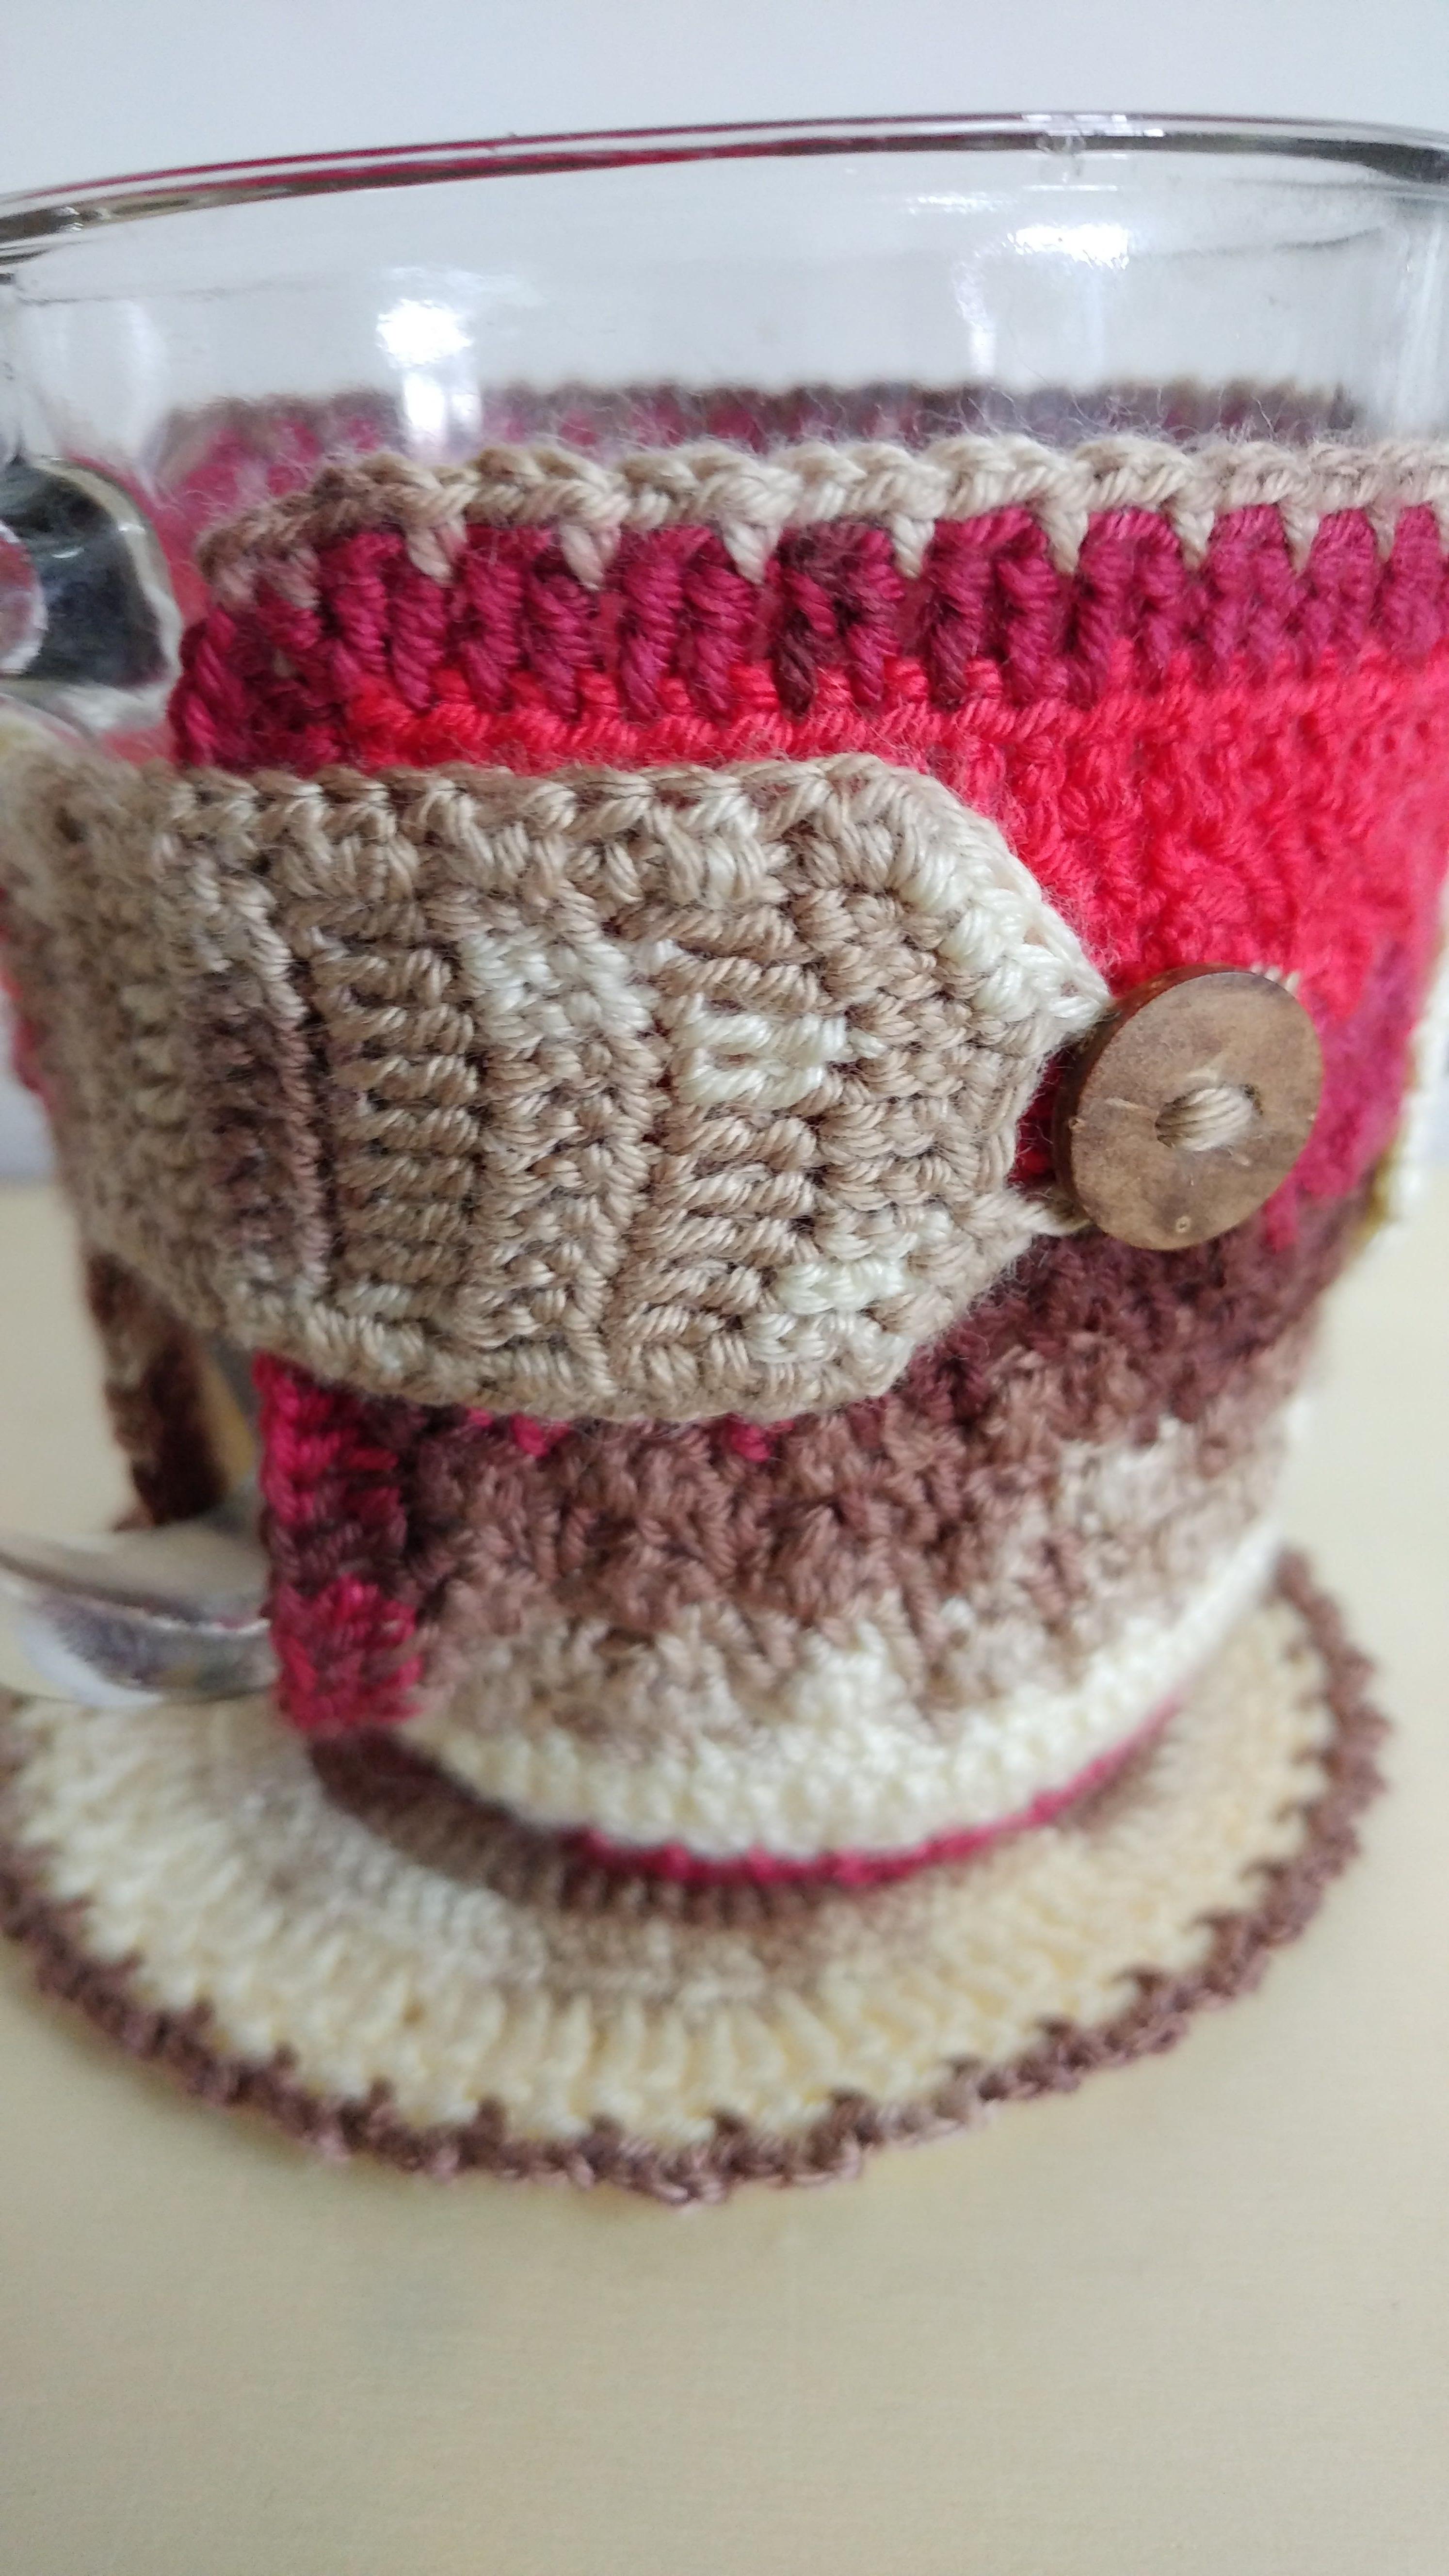 cover mug cozy sweater coaster crochet stocking hot christmas beverages